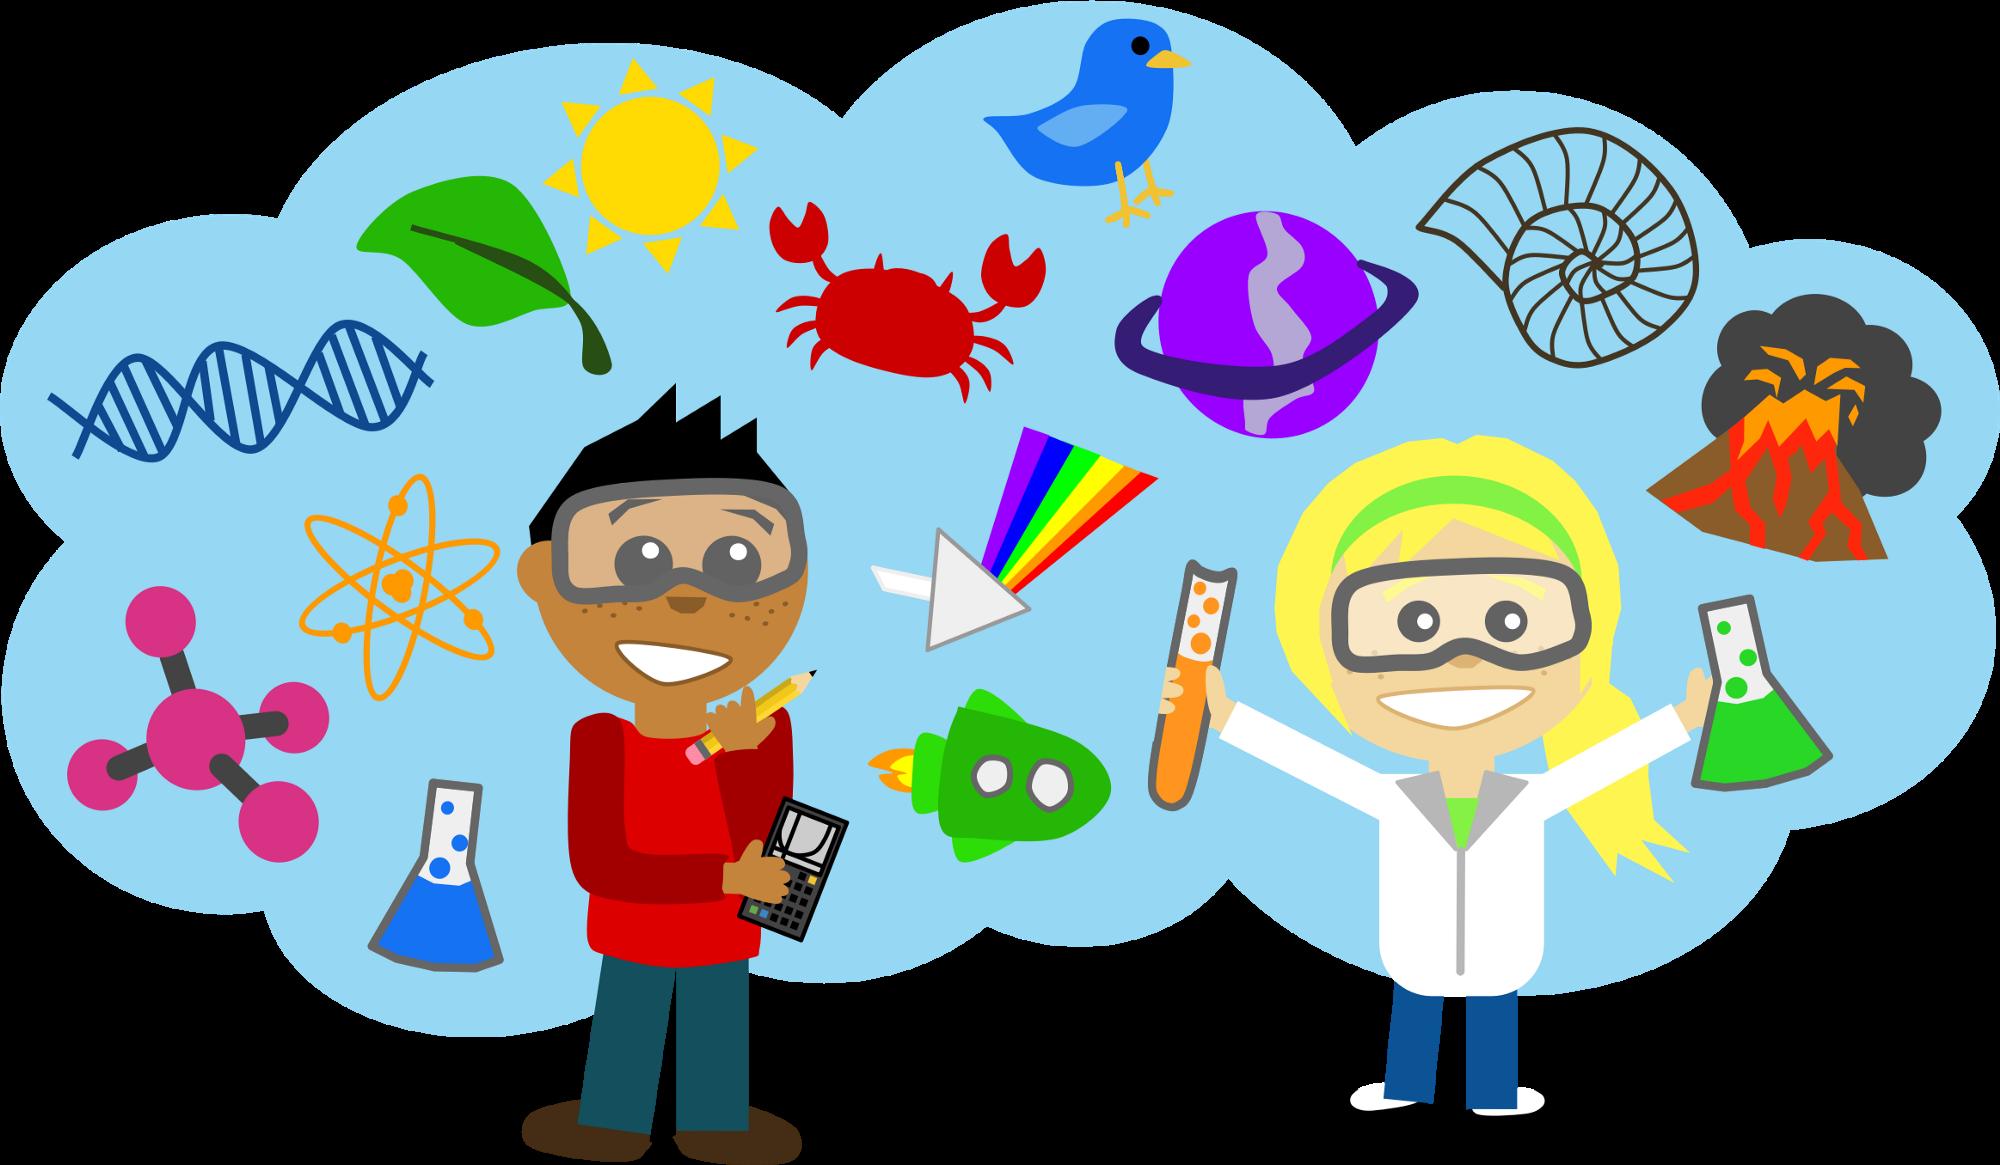 Clipart science natural science, Clipart science natural science Transparent FREE for download on WebStockReview 2020